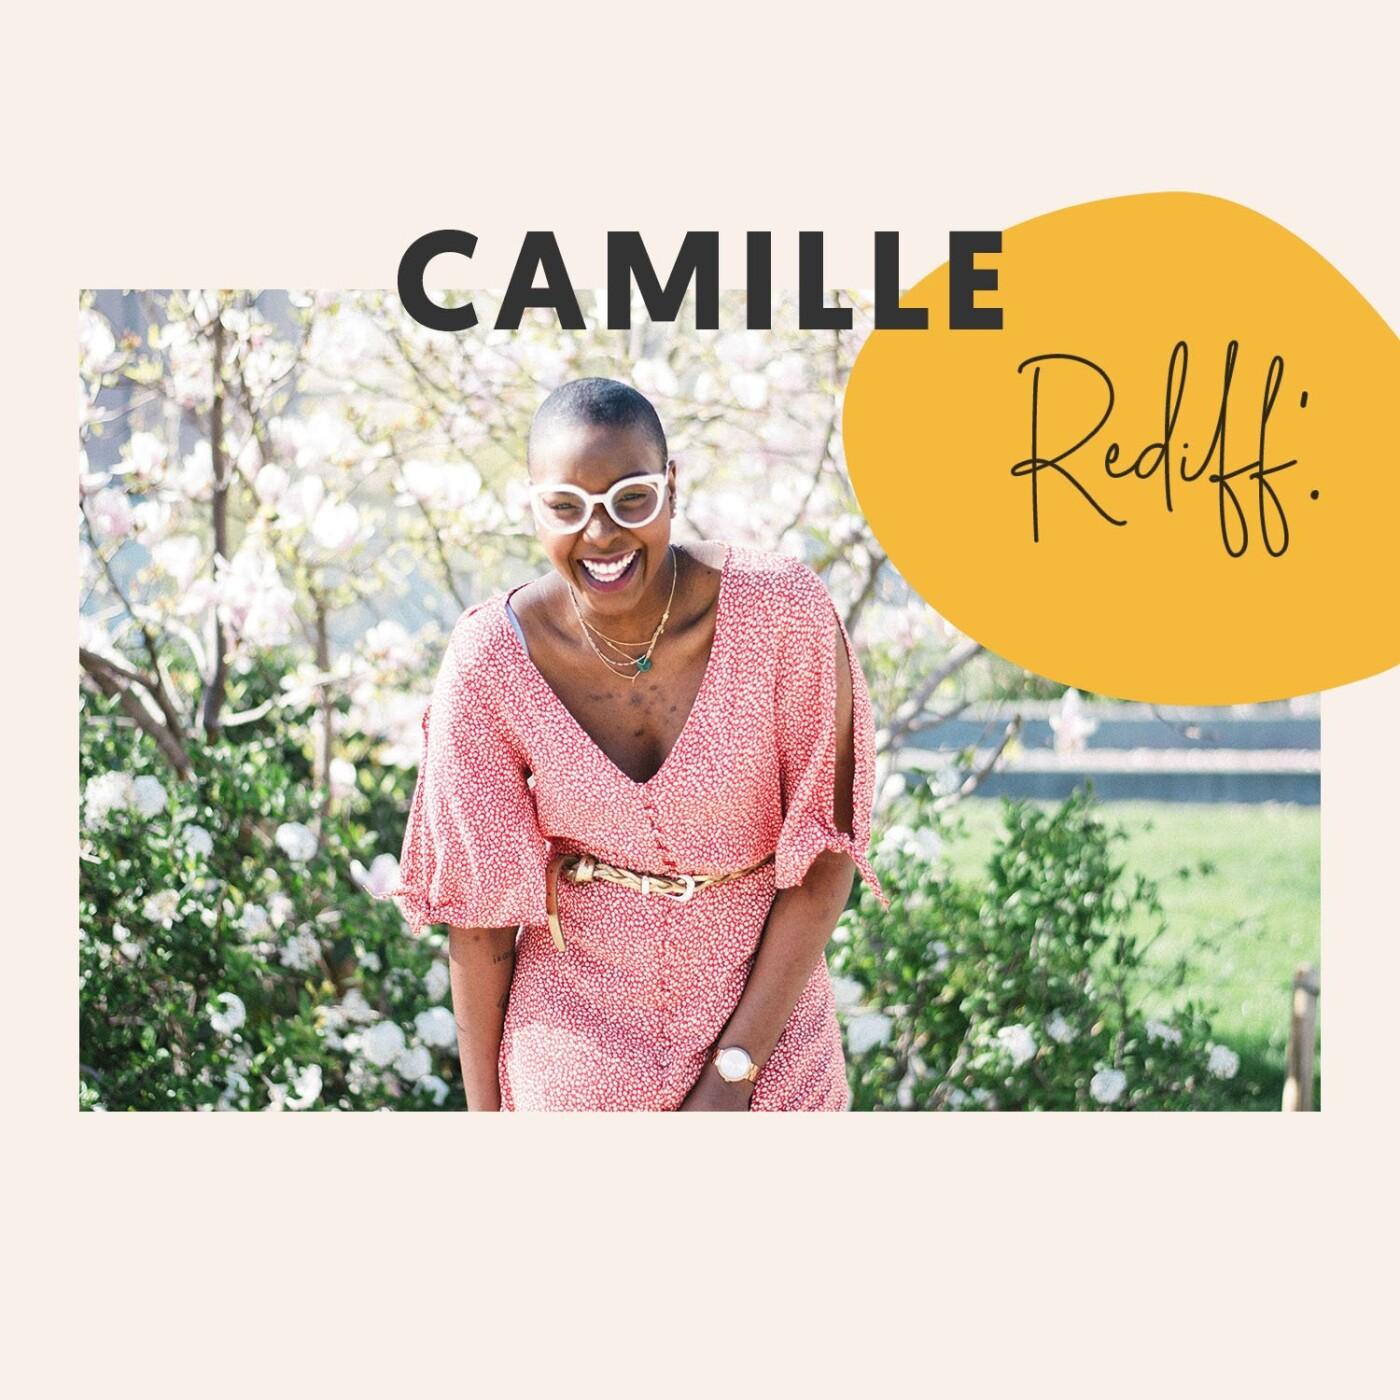 Rediff' • Camille